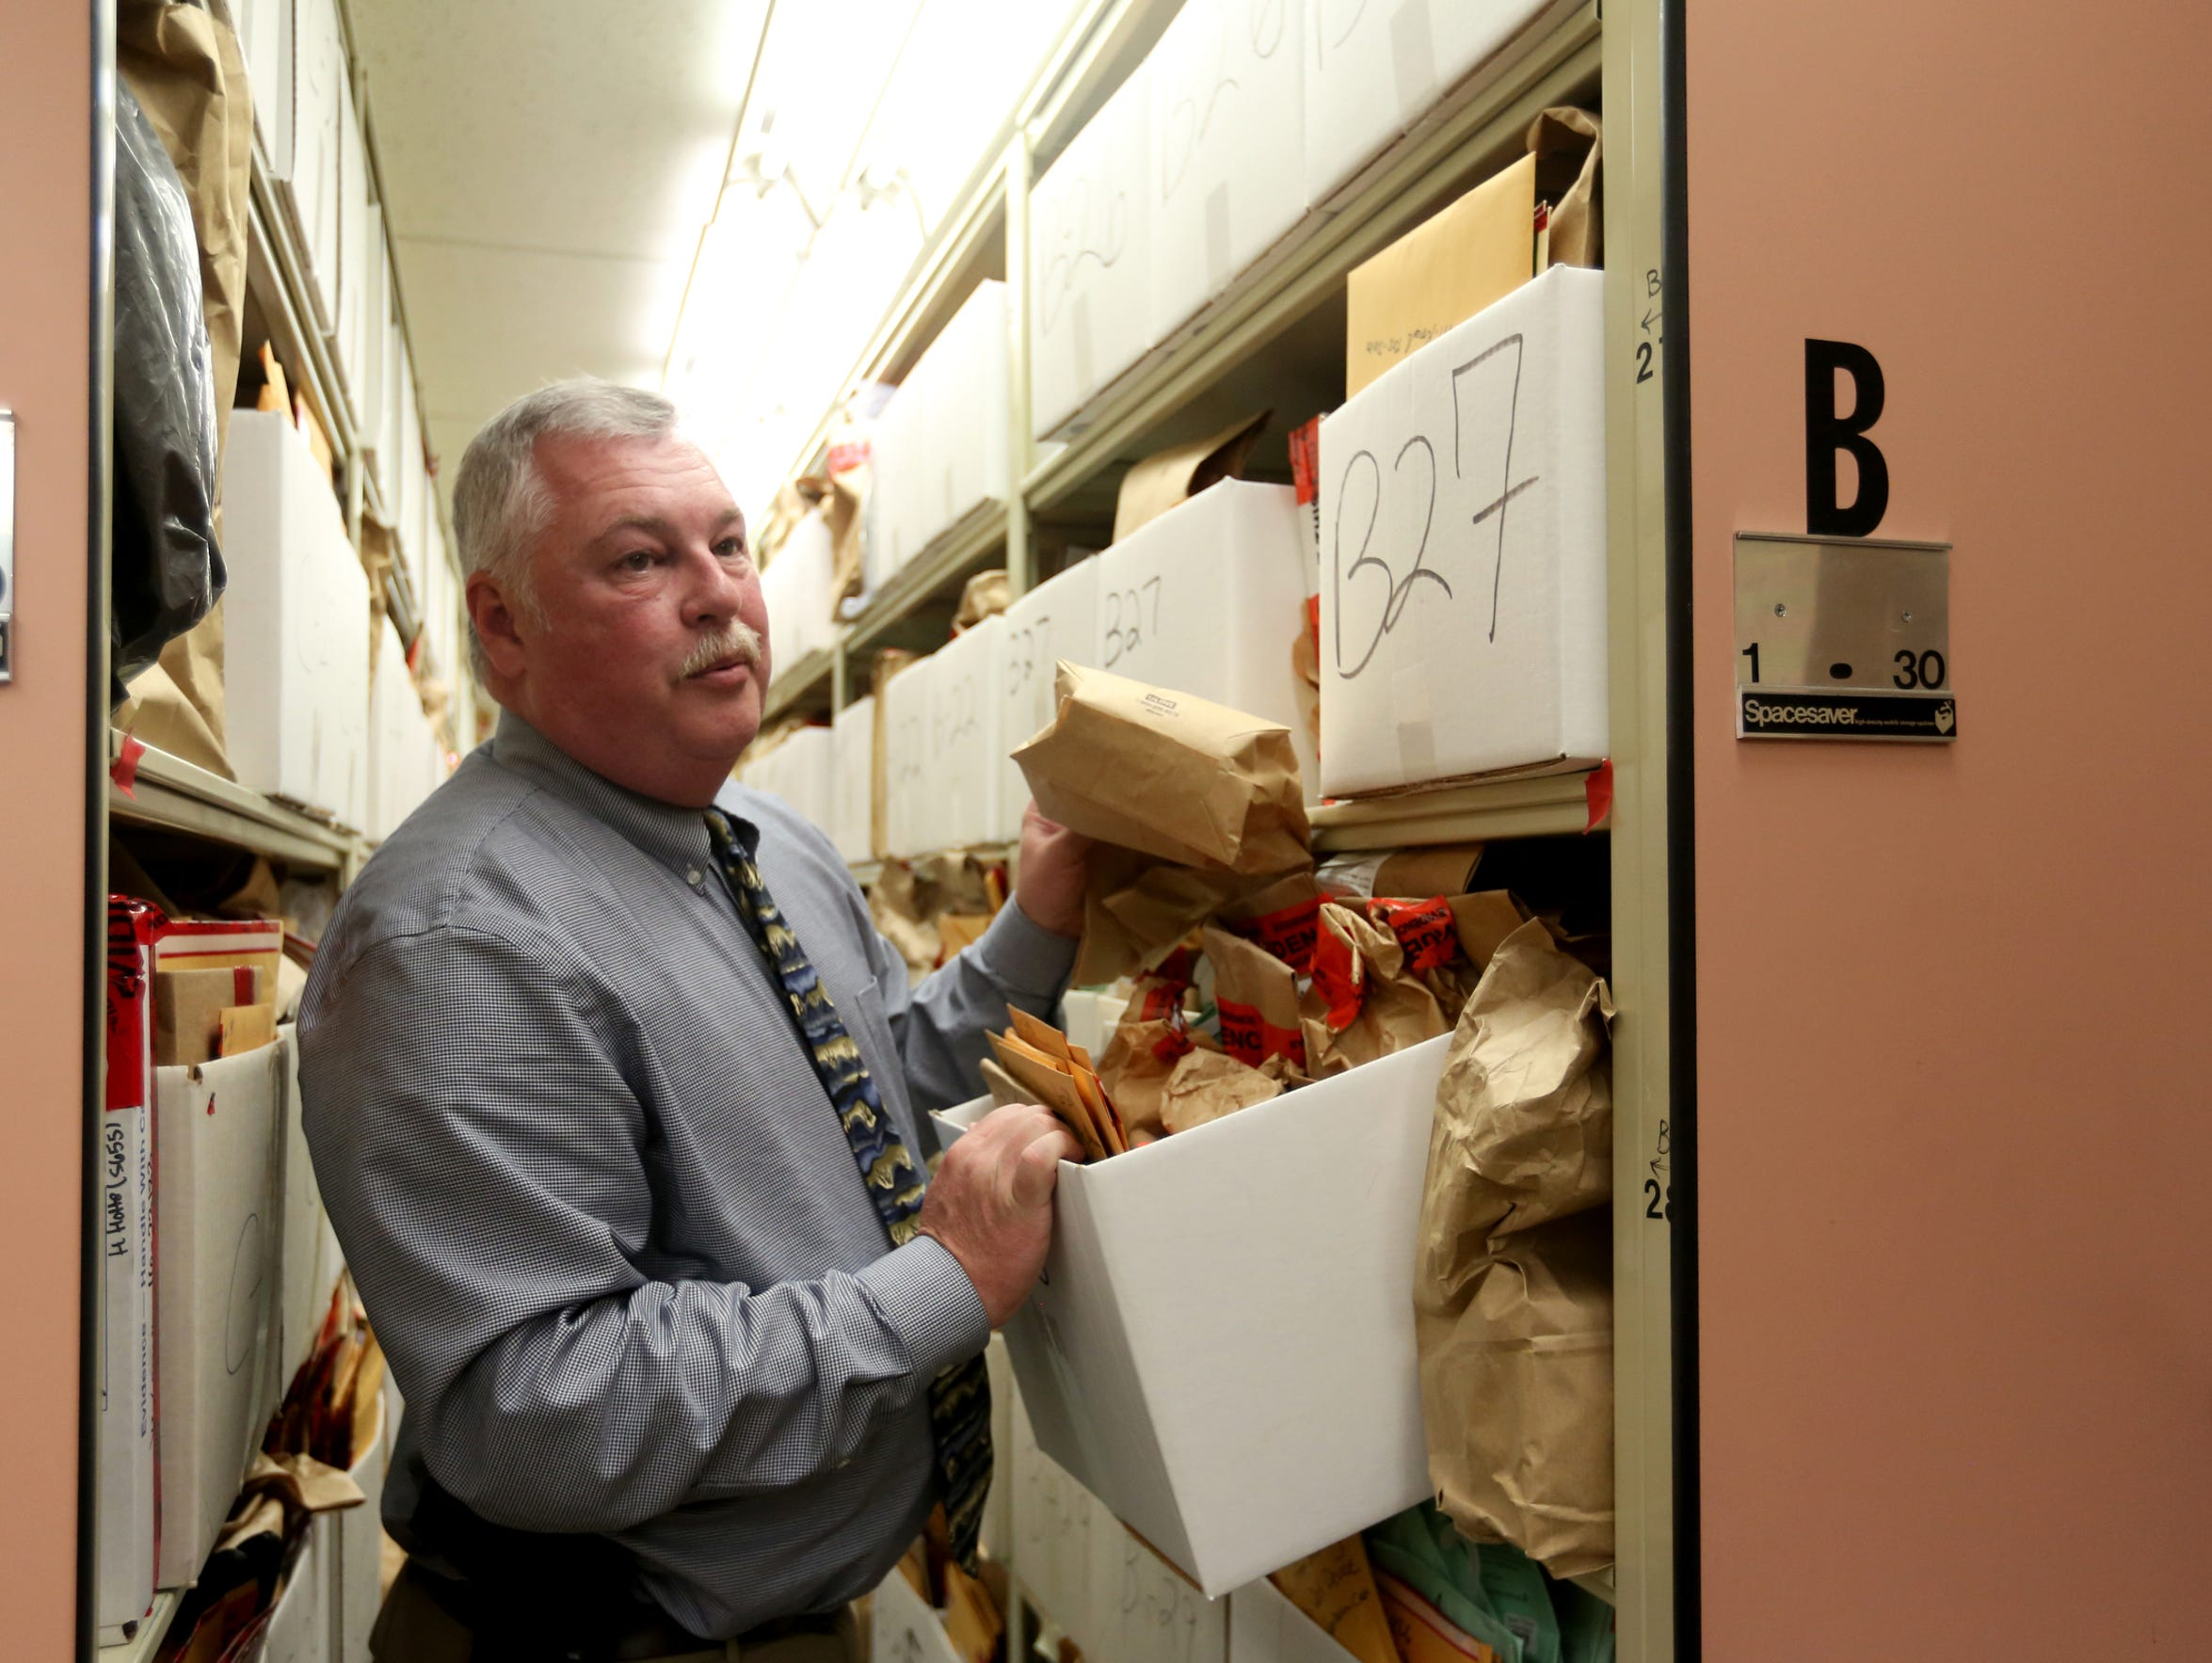 Deputy Chief Steve Bellshaw look through evidence boxes